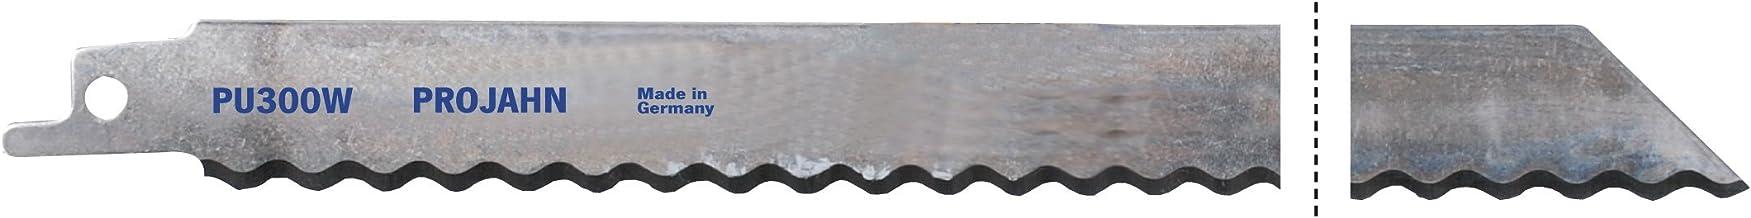 Projahn VE3 64307 PU300W - Hoja para sierra sable (300 mm)